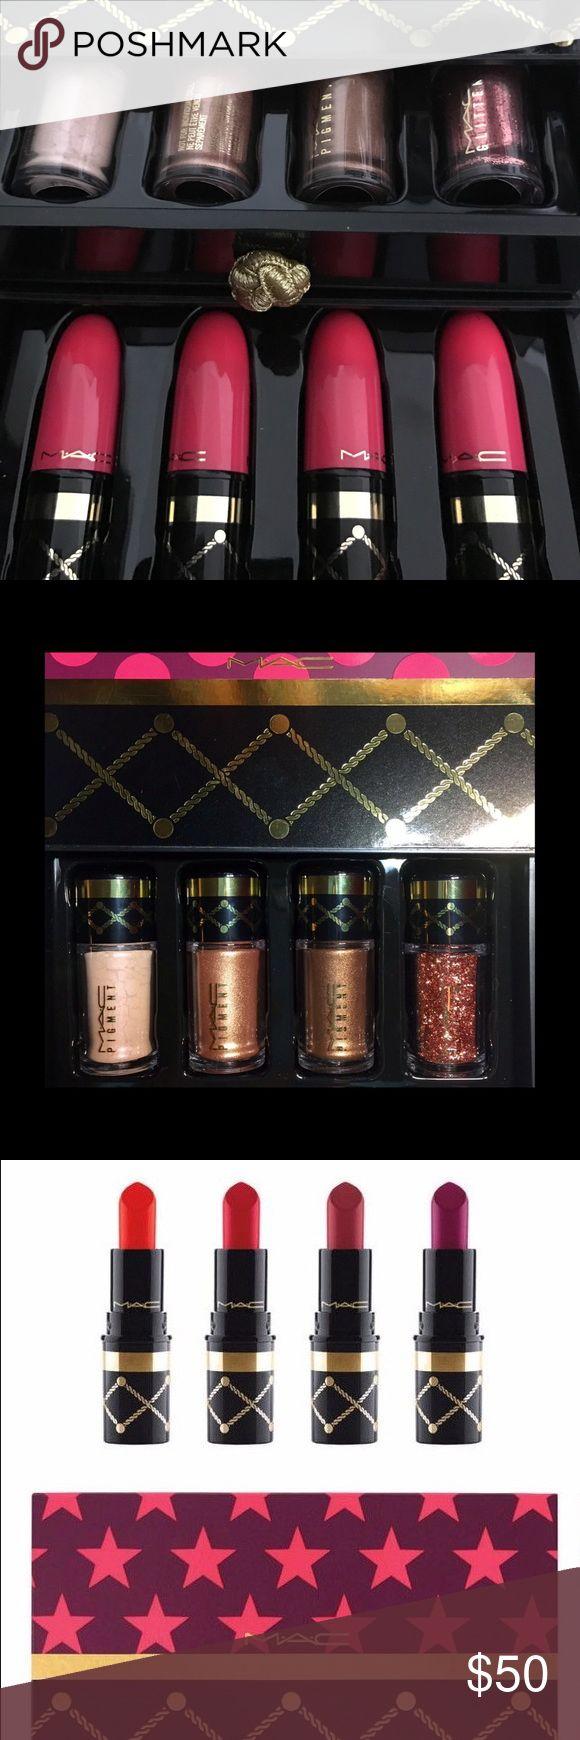 The 25+ best Mac makeup gift sets ideas on Pinterest | Makeup gift ...